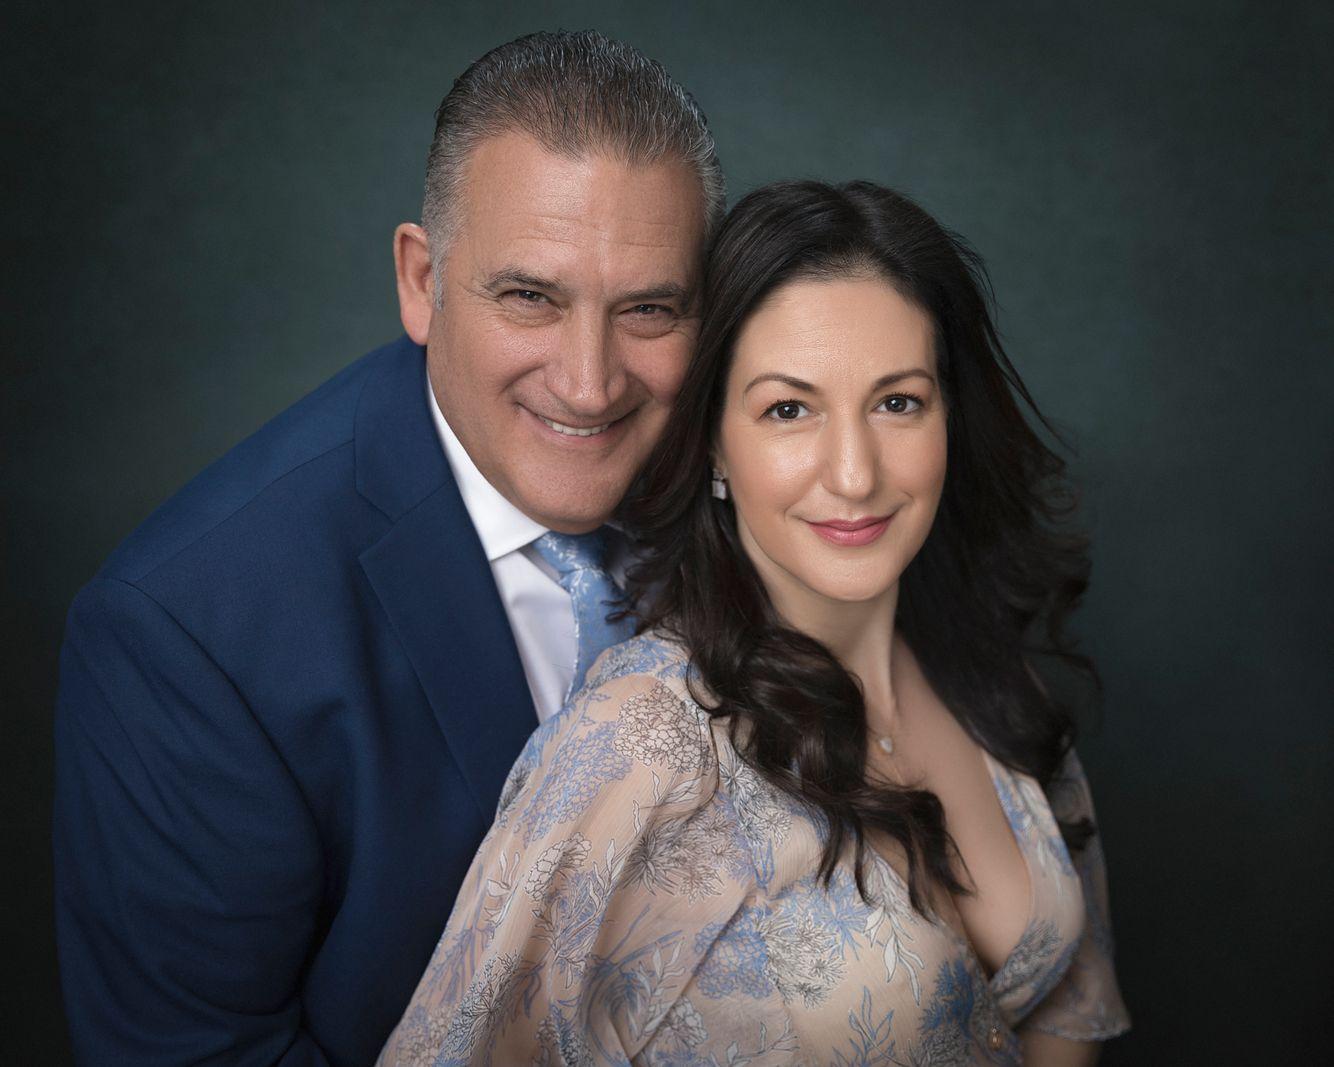 Mother & Husband Portraits